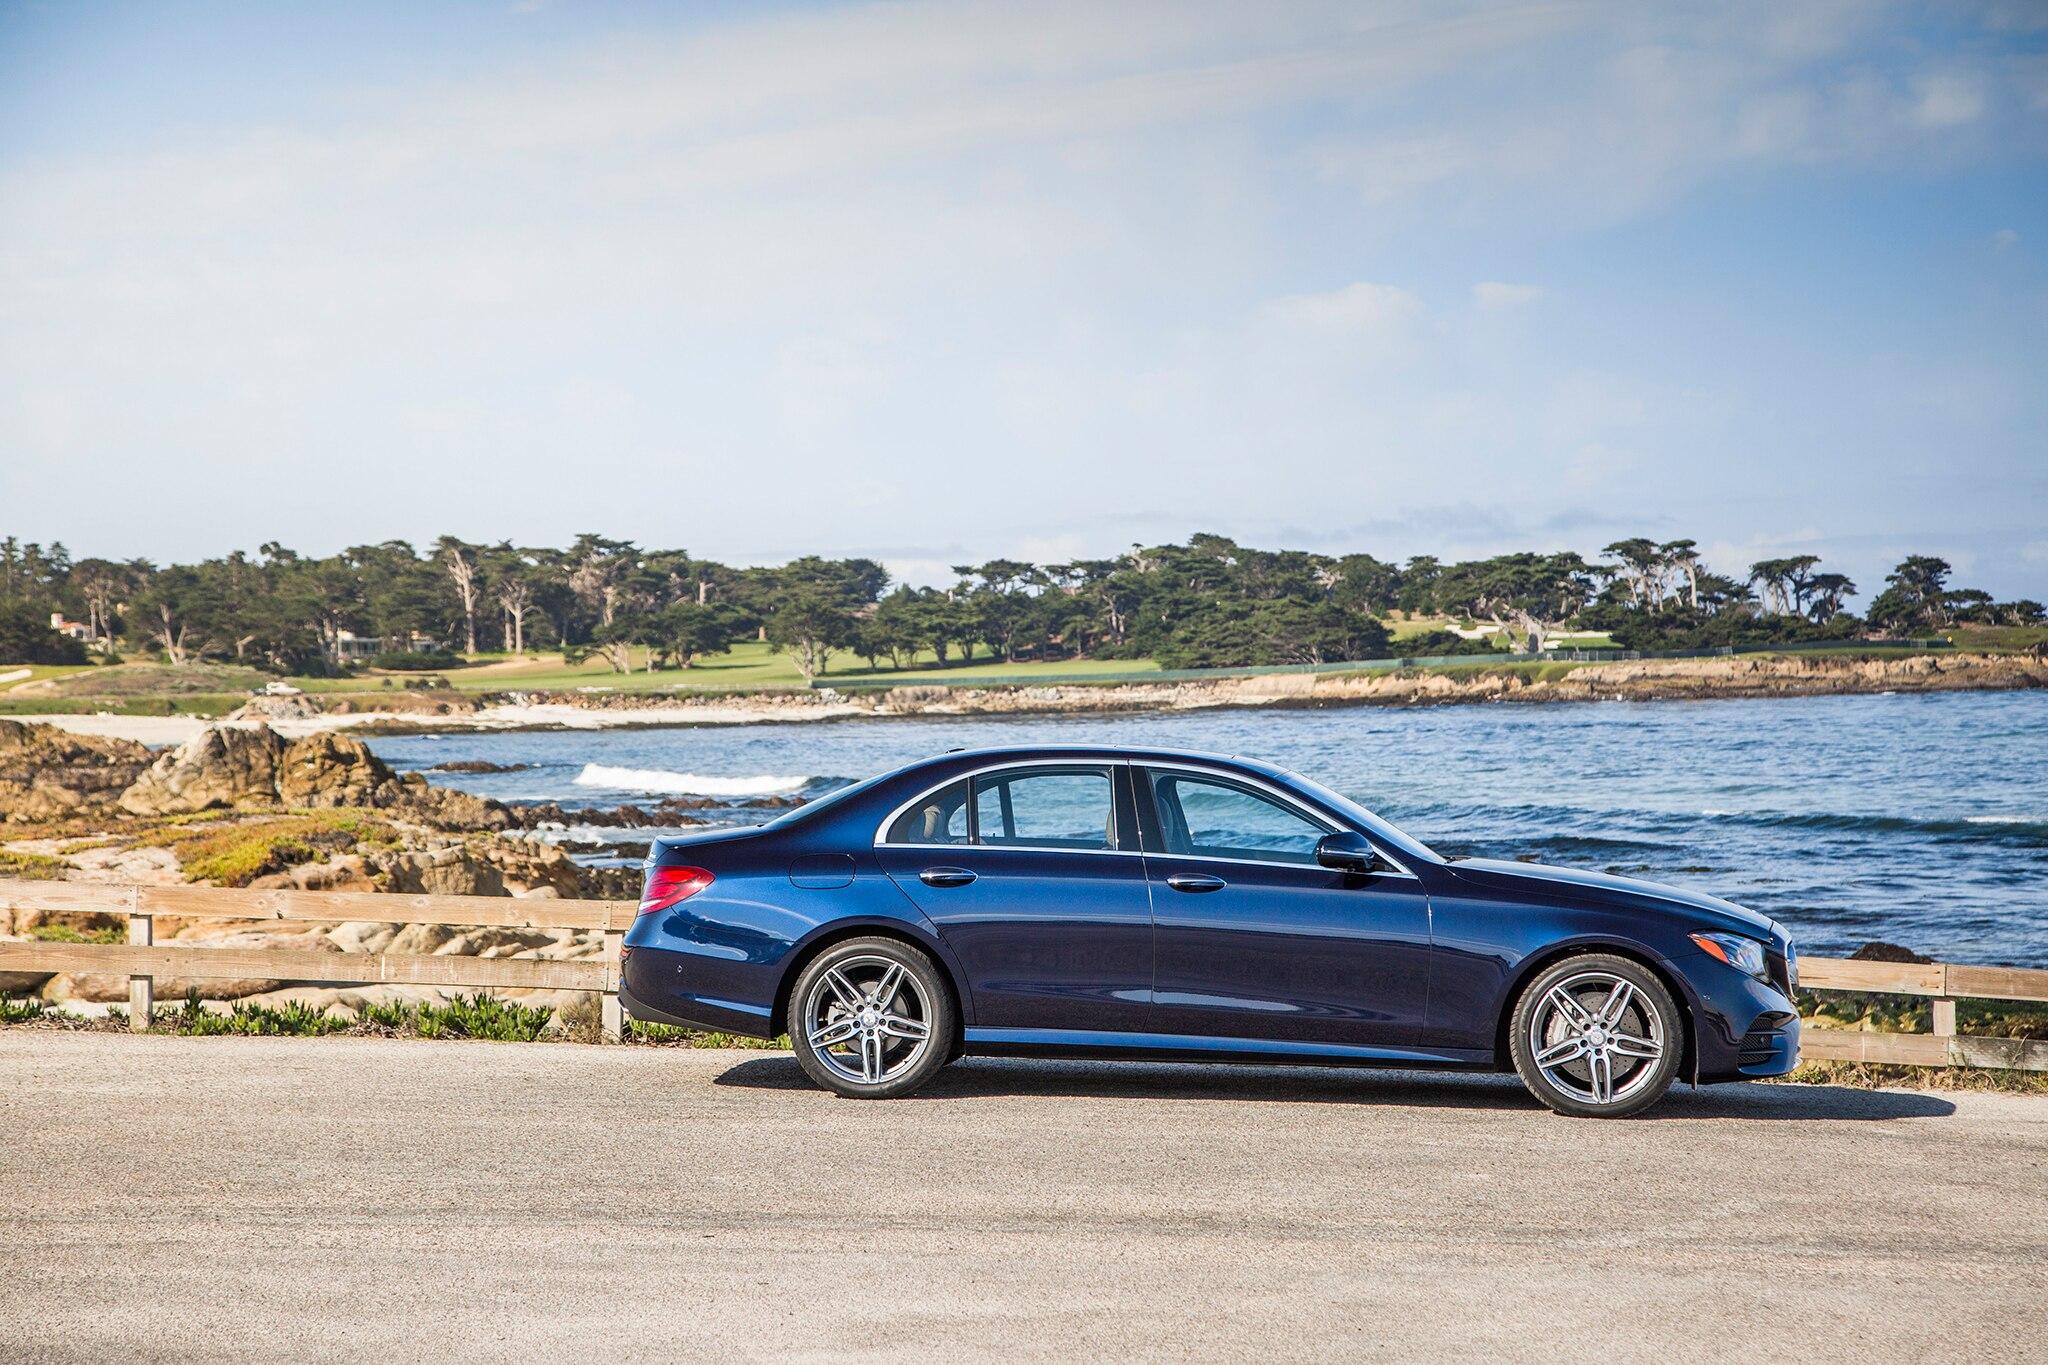 2017 mercedes benz e300 4matic side profile 02 for Mercedes benz e300 4matic